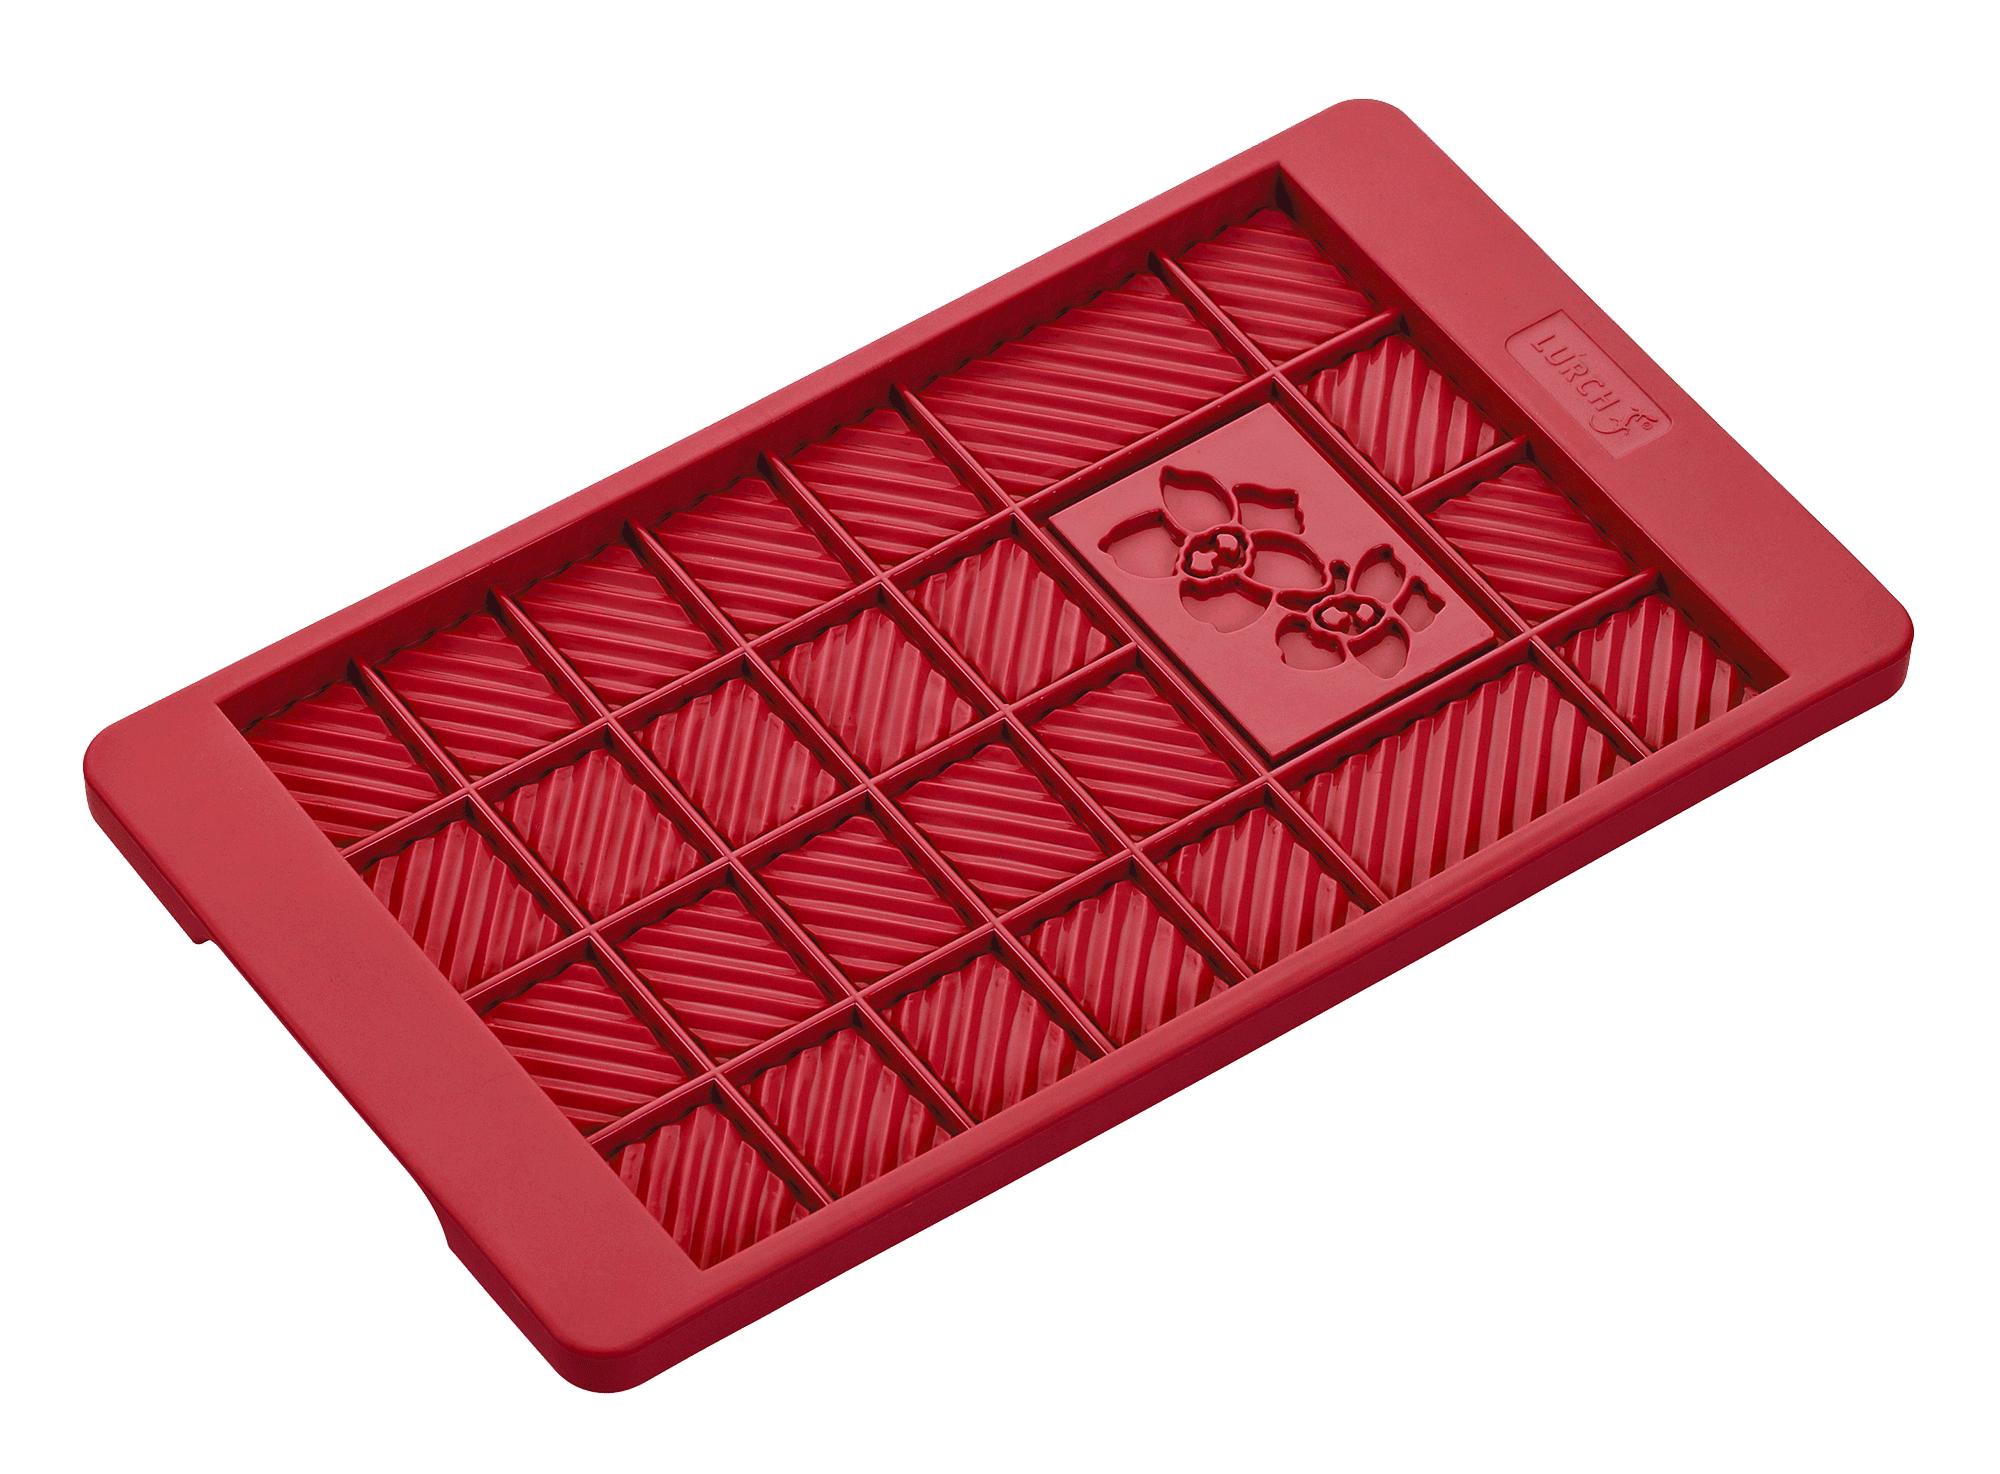 Flexiform Schokoladentafel 12x20,5cm ruby